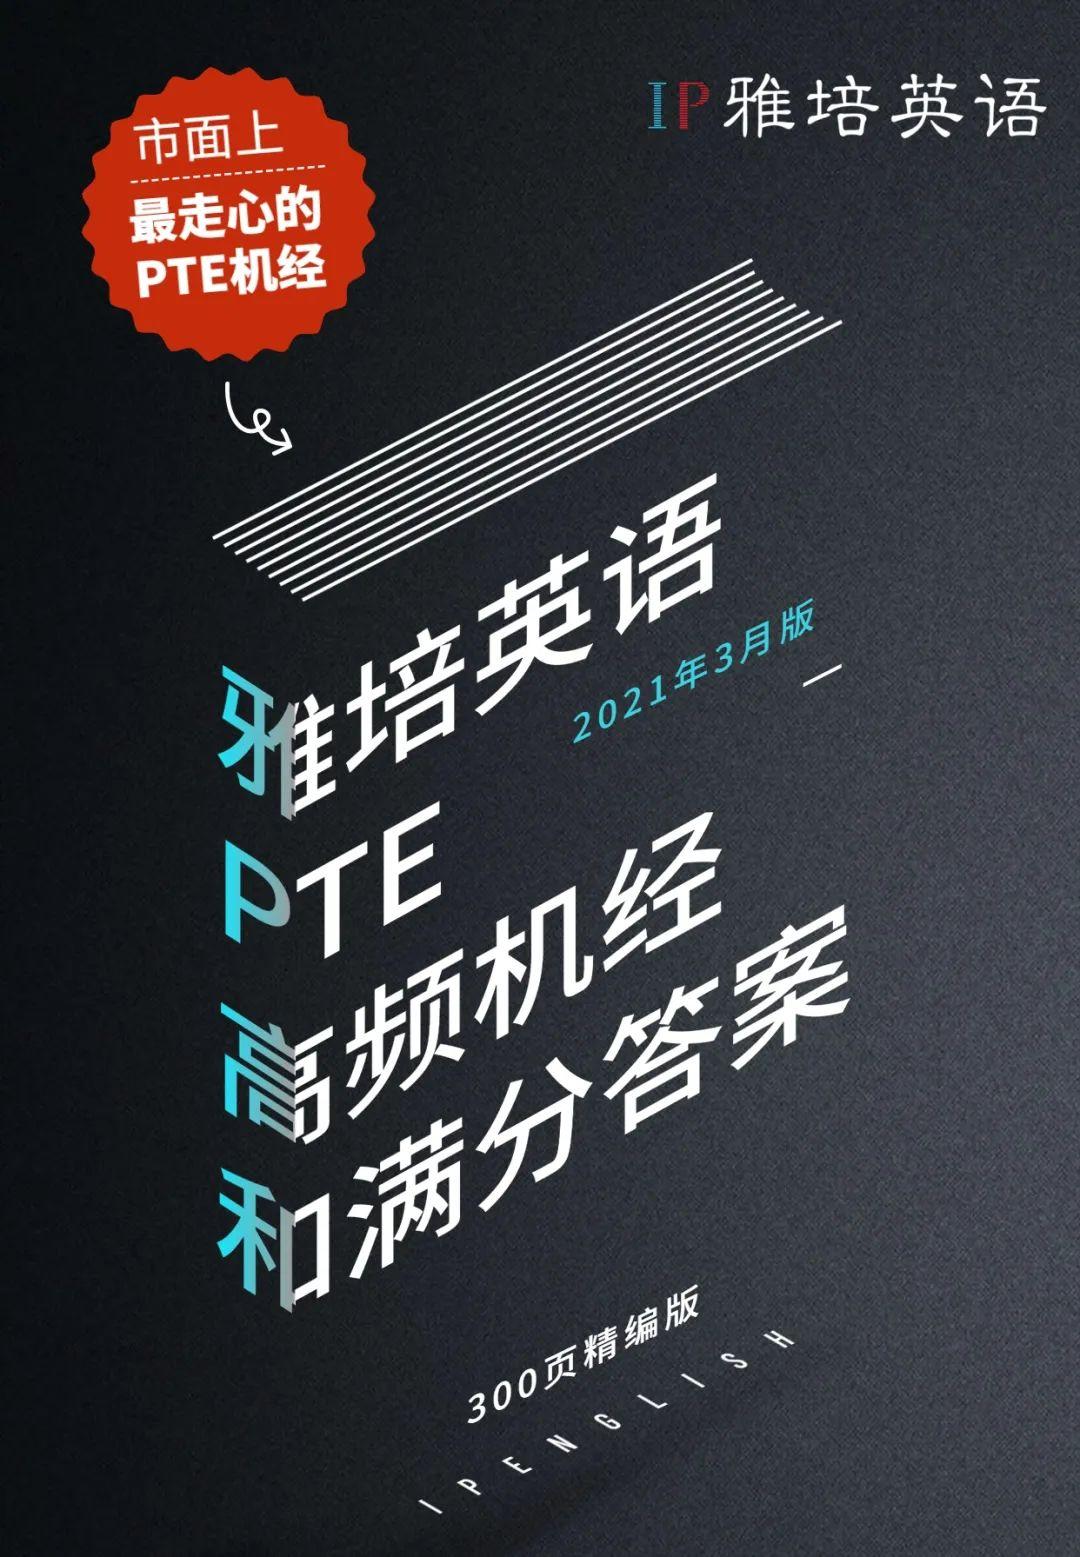 PTE口语实用提分小技巧-一个有[爱]的音标